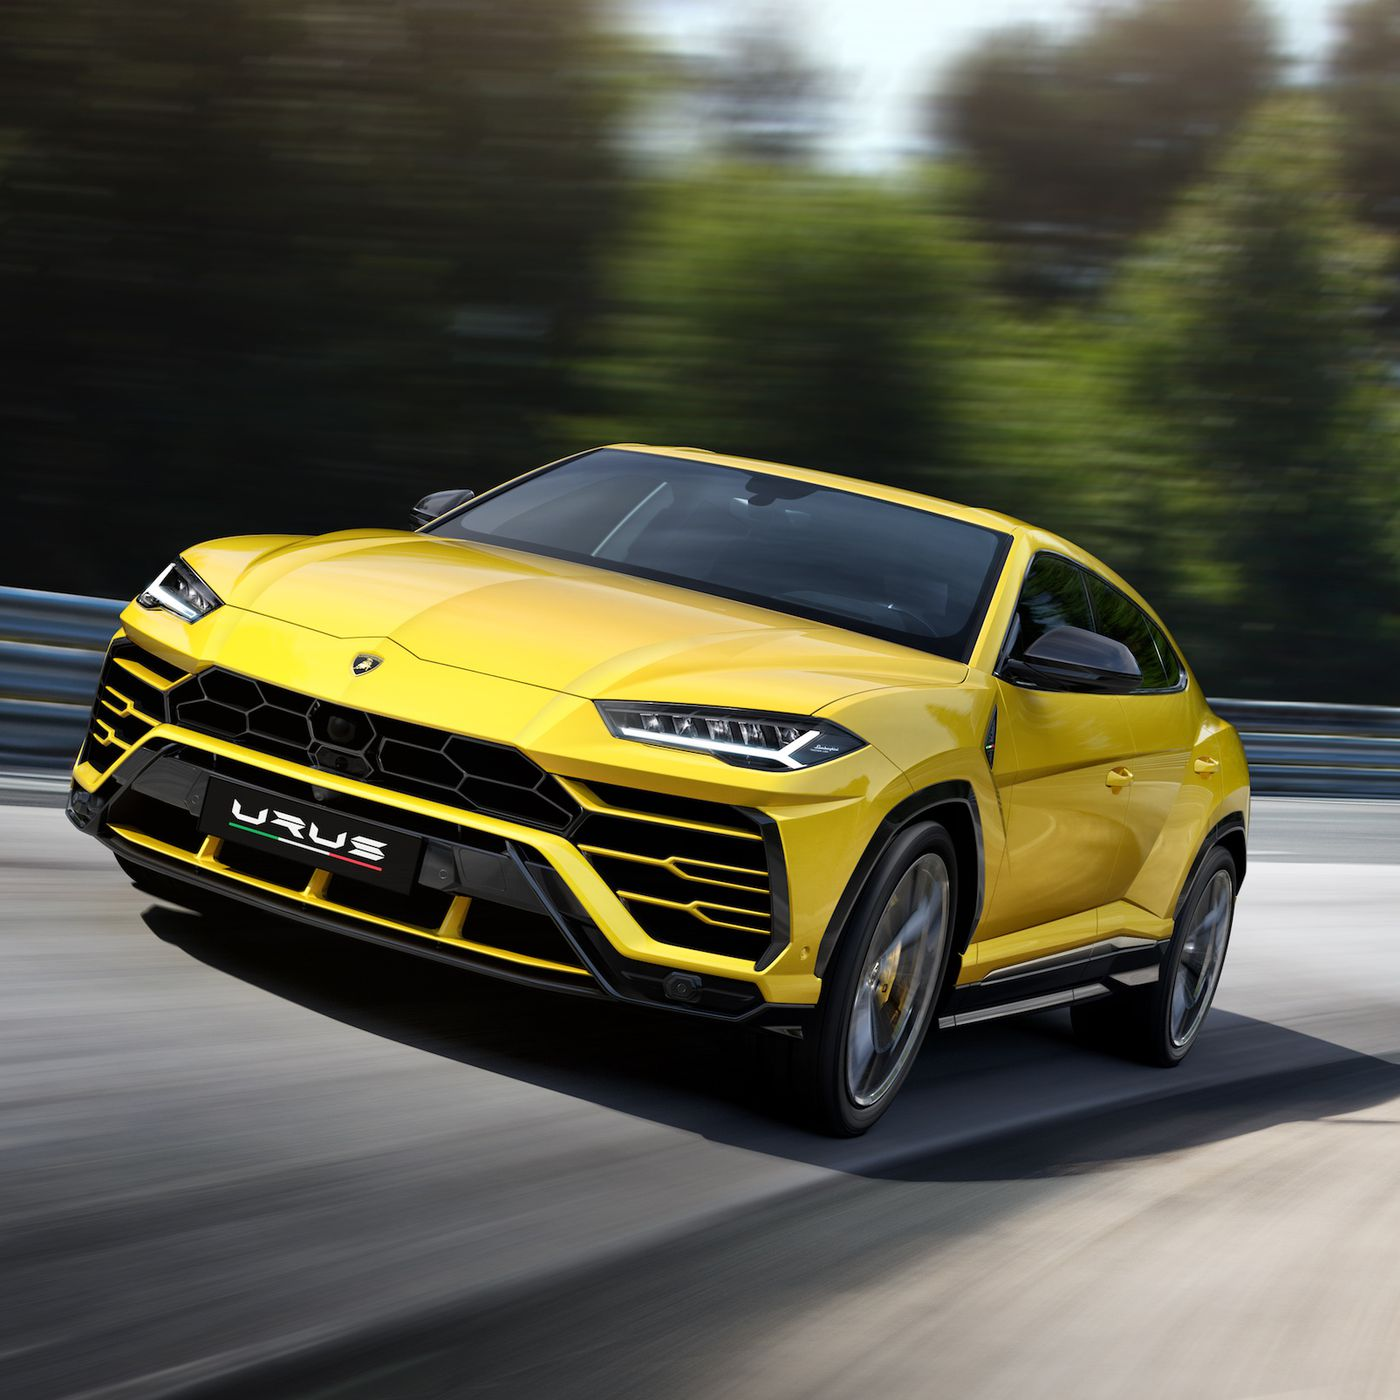 The Lamborghini Urus Is The Latest 200 000 Suv The Verge